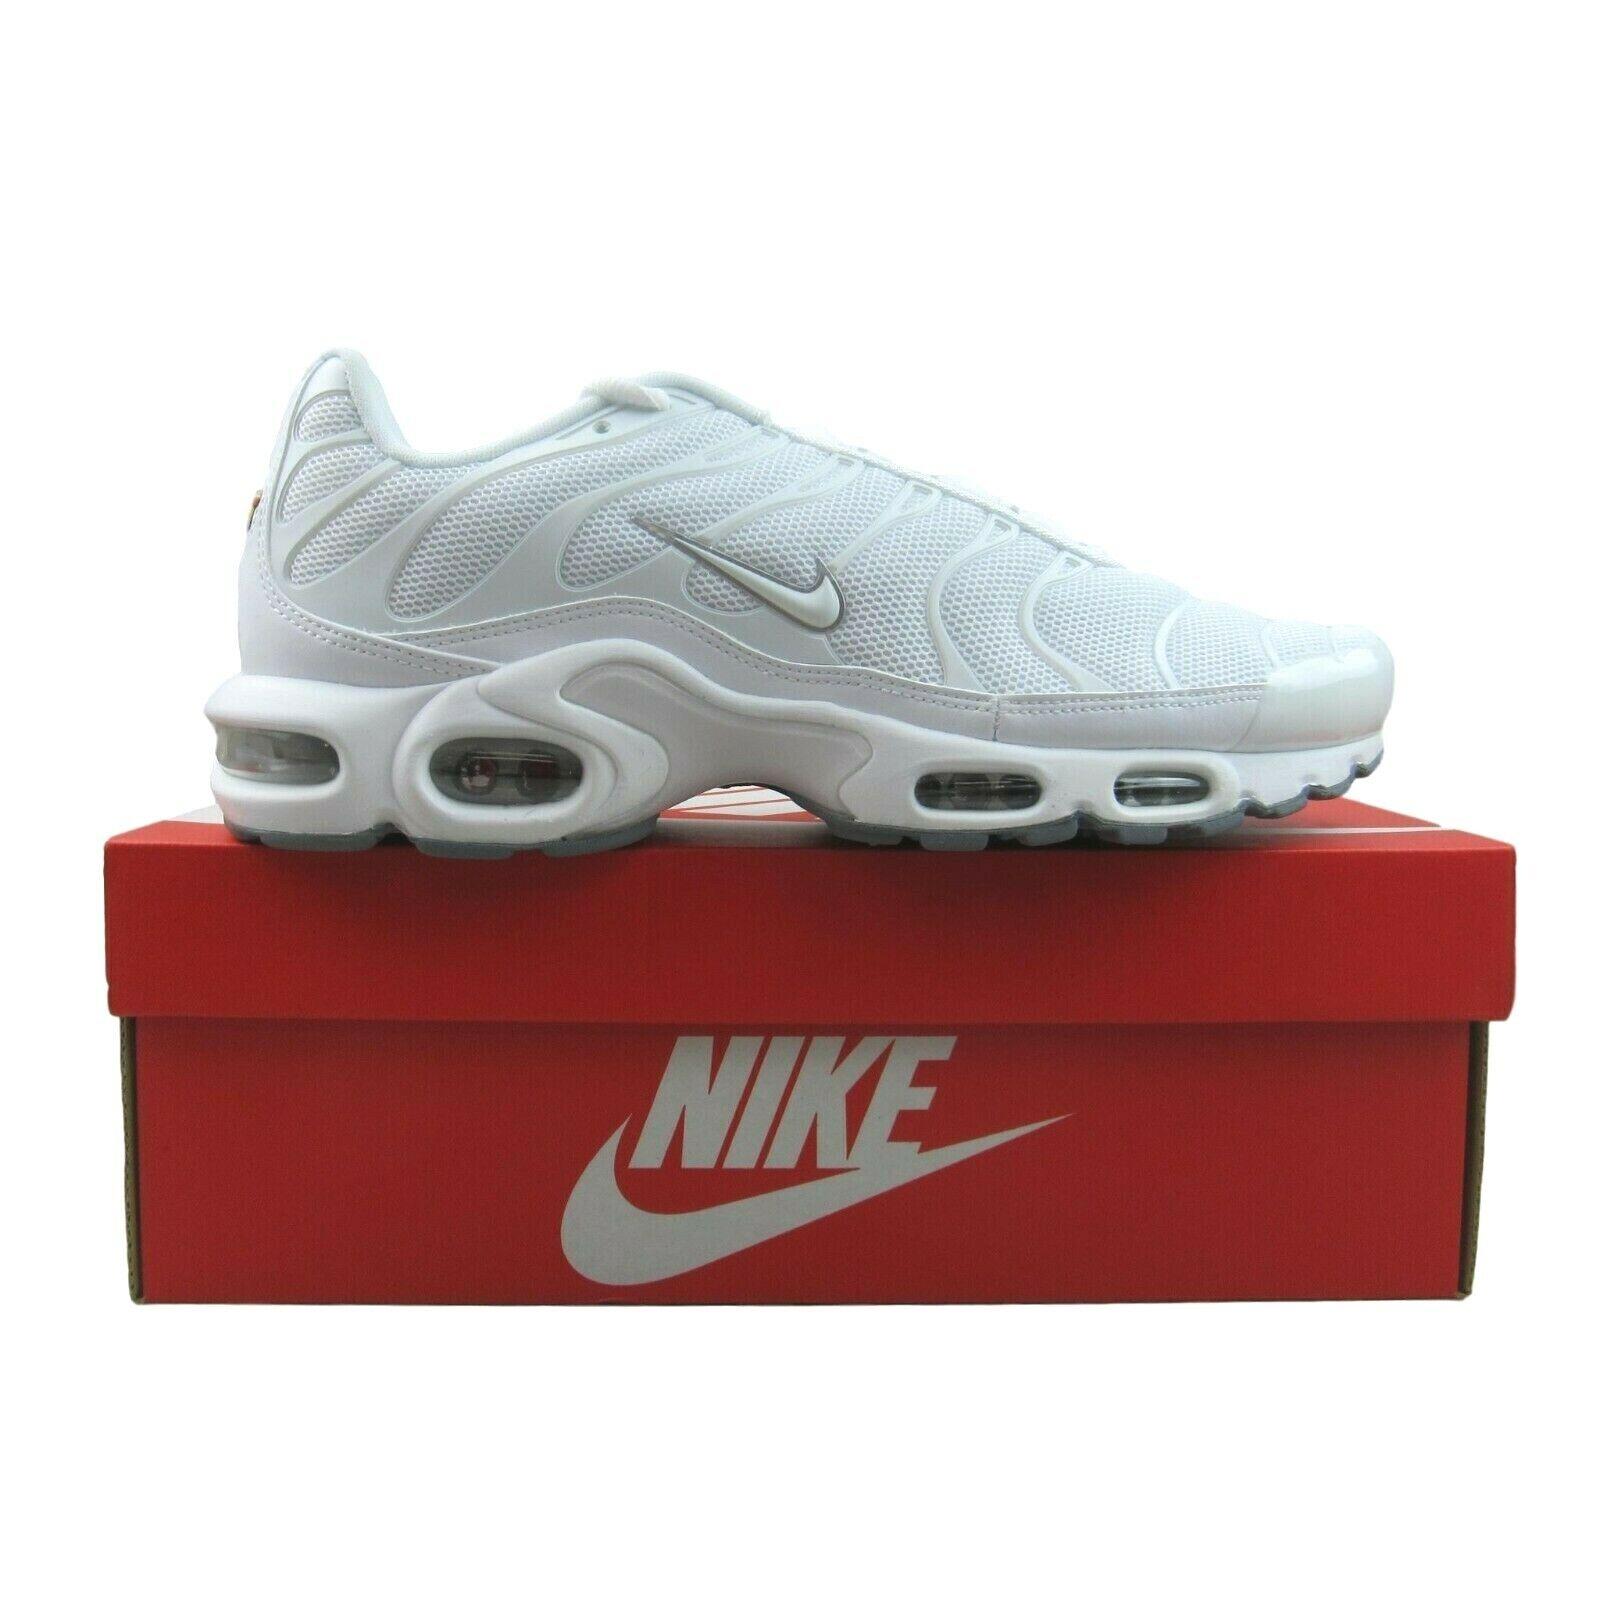 Nike Air Max Plus TN Triple White Running Shoes NEW 604133 139 Mens Multi Size